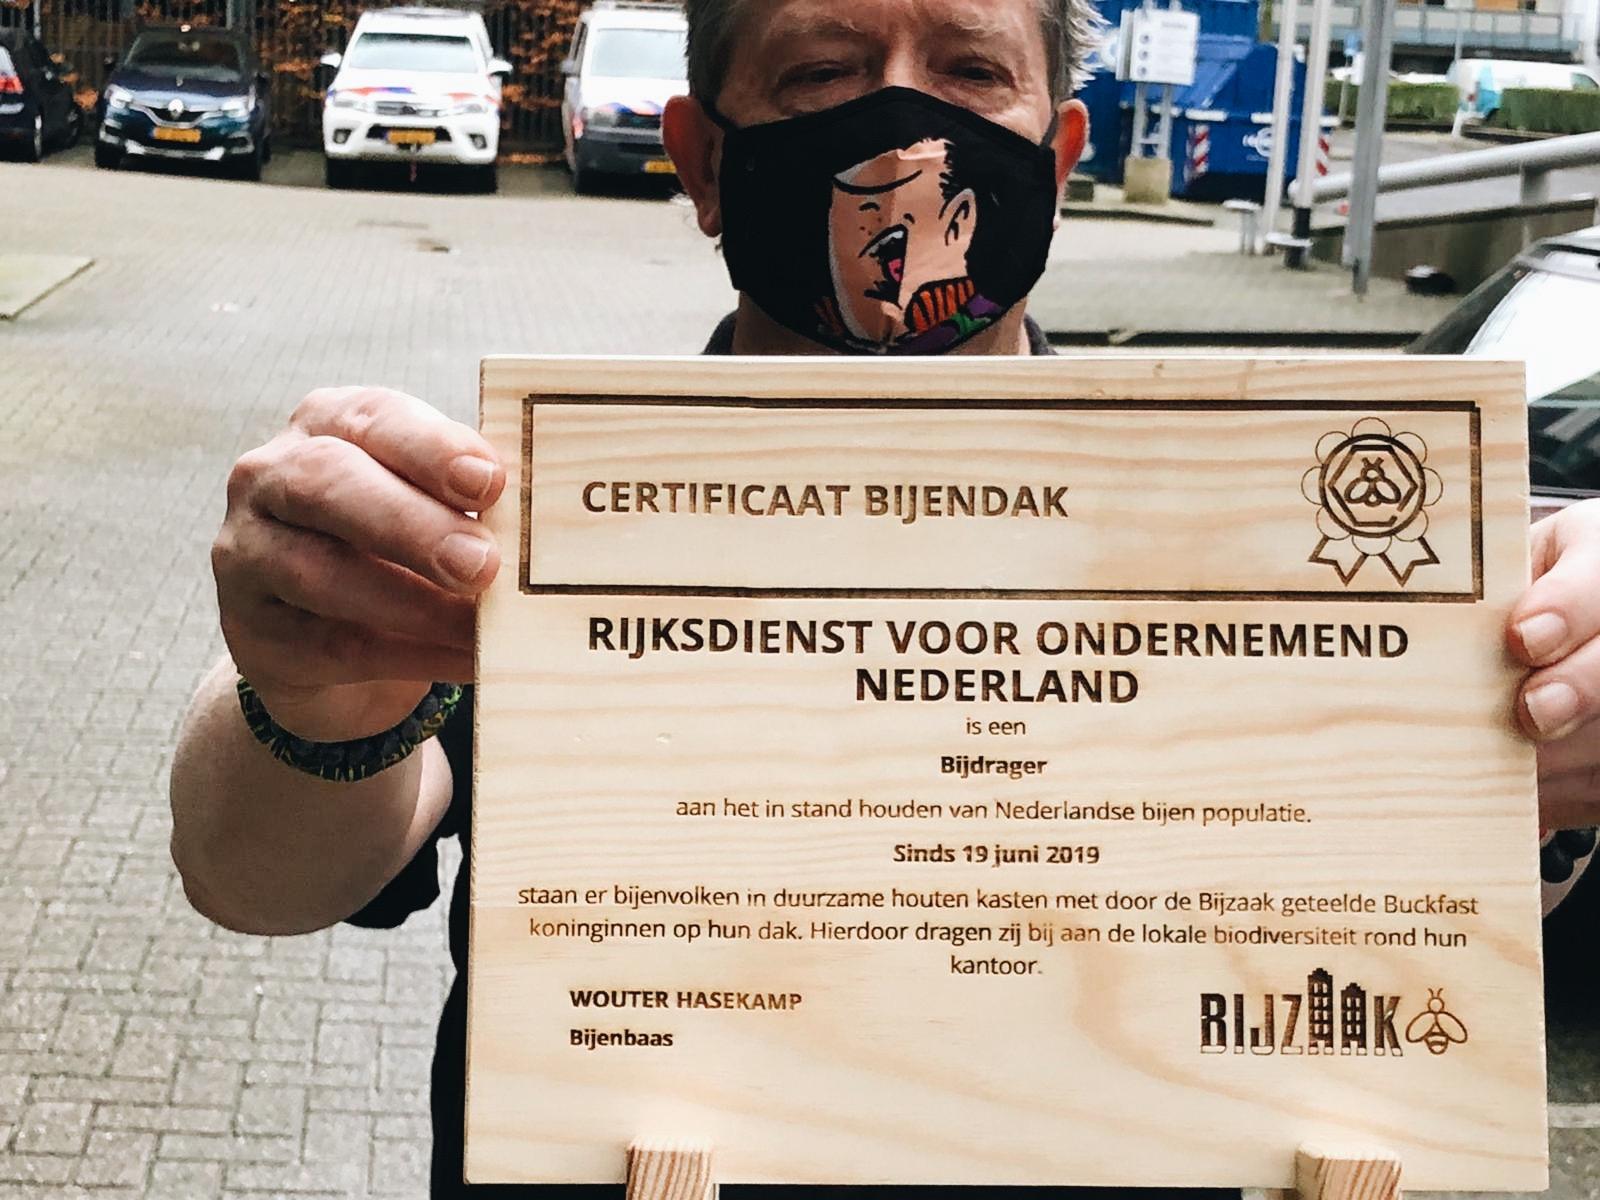 Bijendak Certificaat RVO